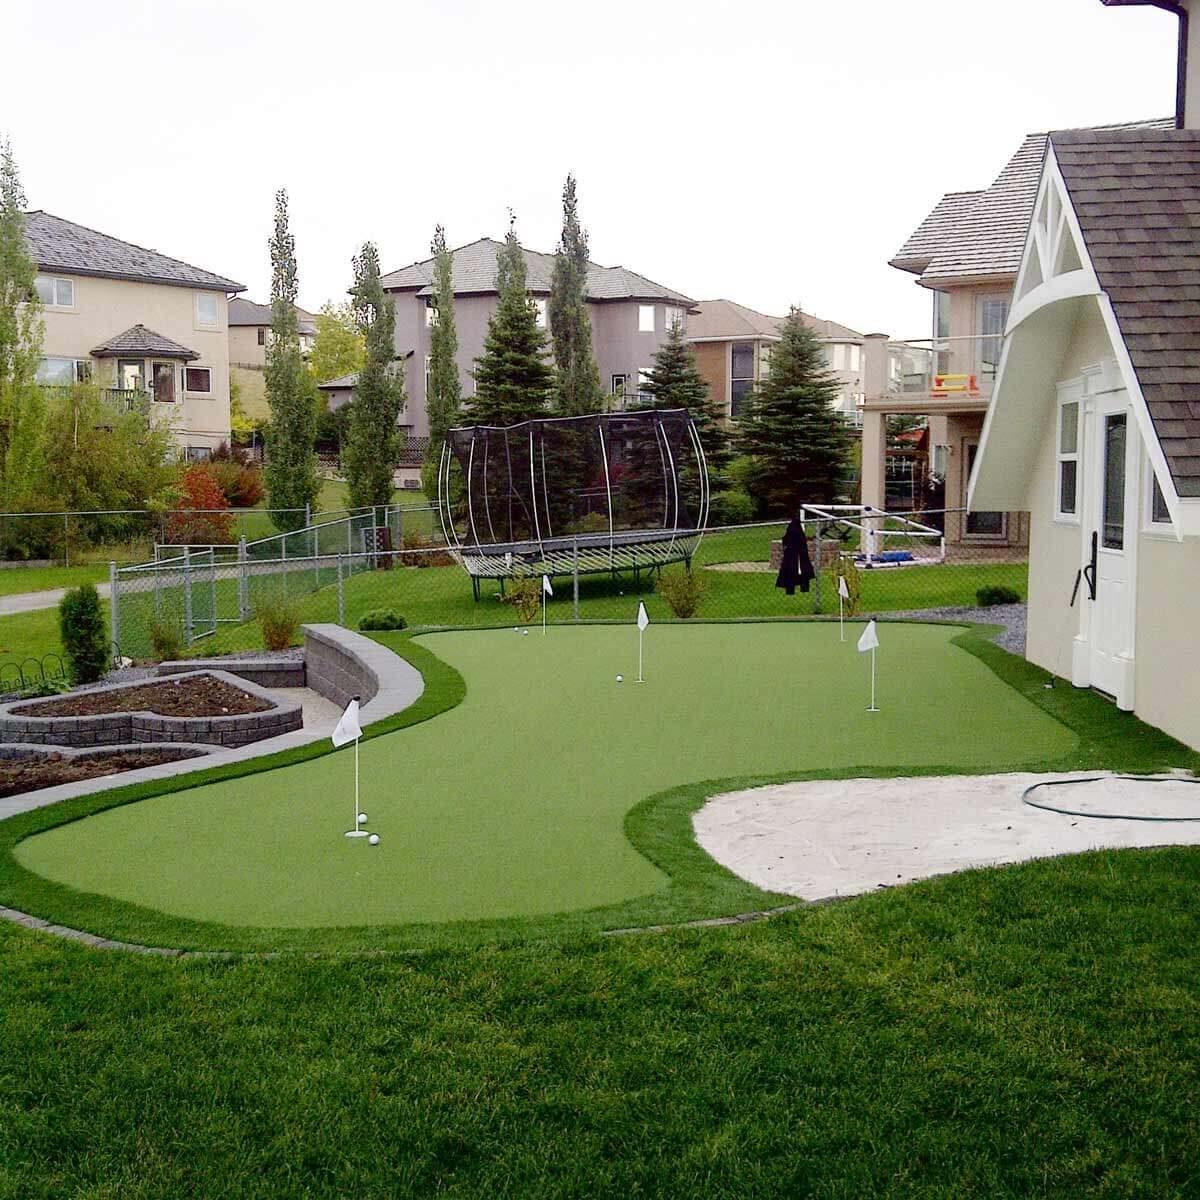 19 Crazy Cool Backyard Putting Greens — The Family Handyman on Putting Green Ideas For Backyard id=83205